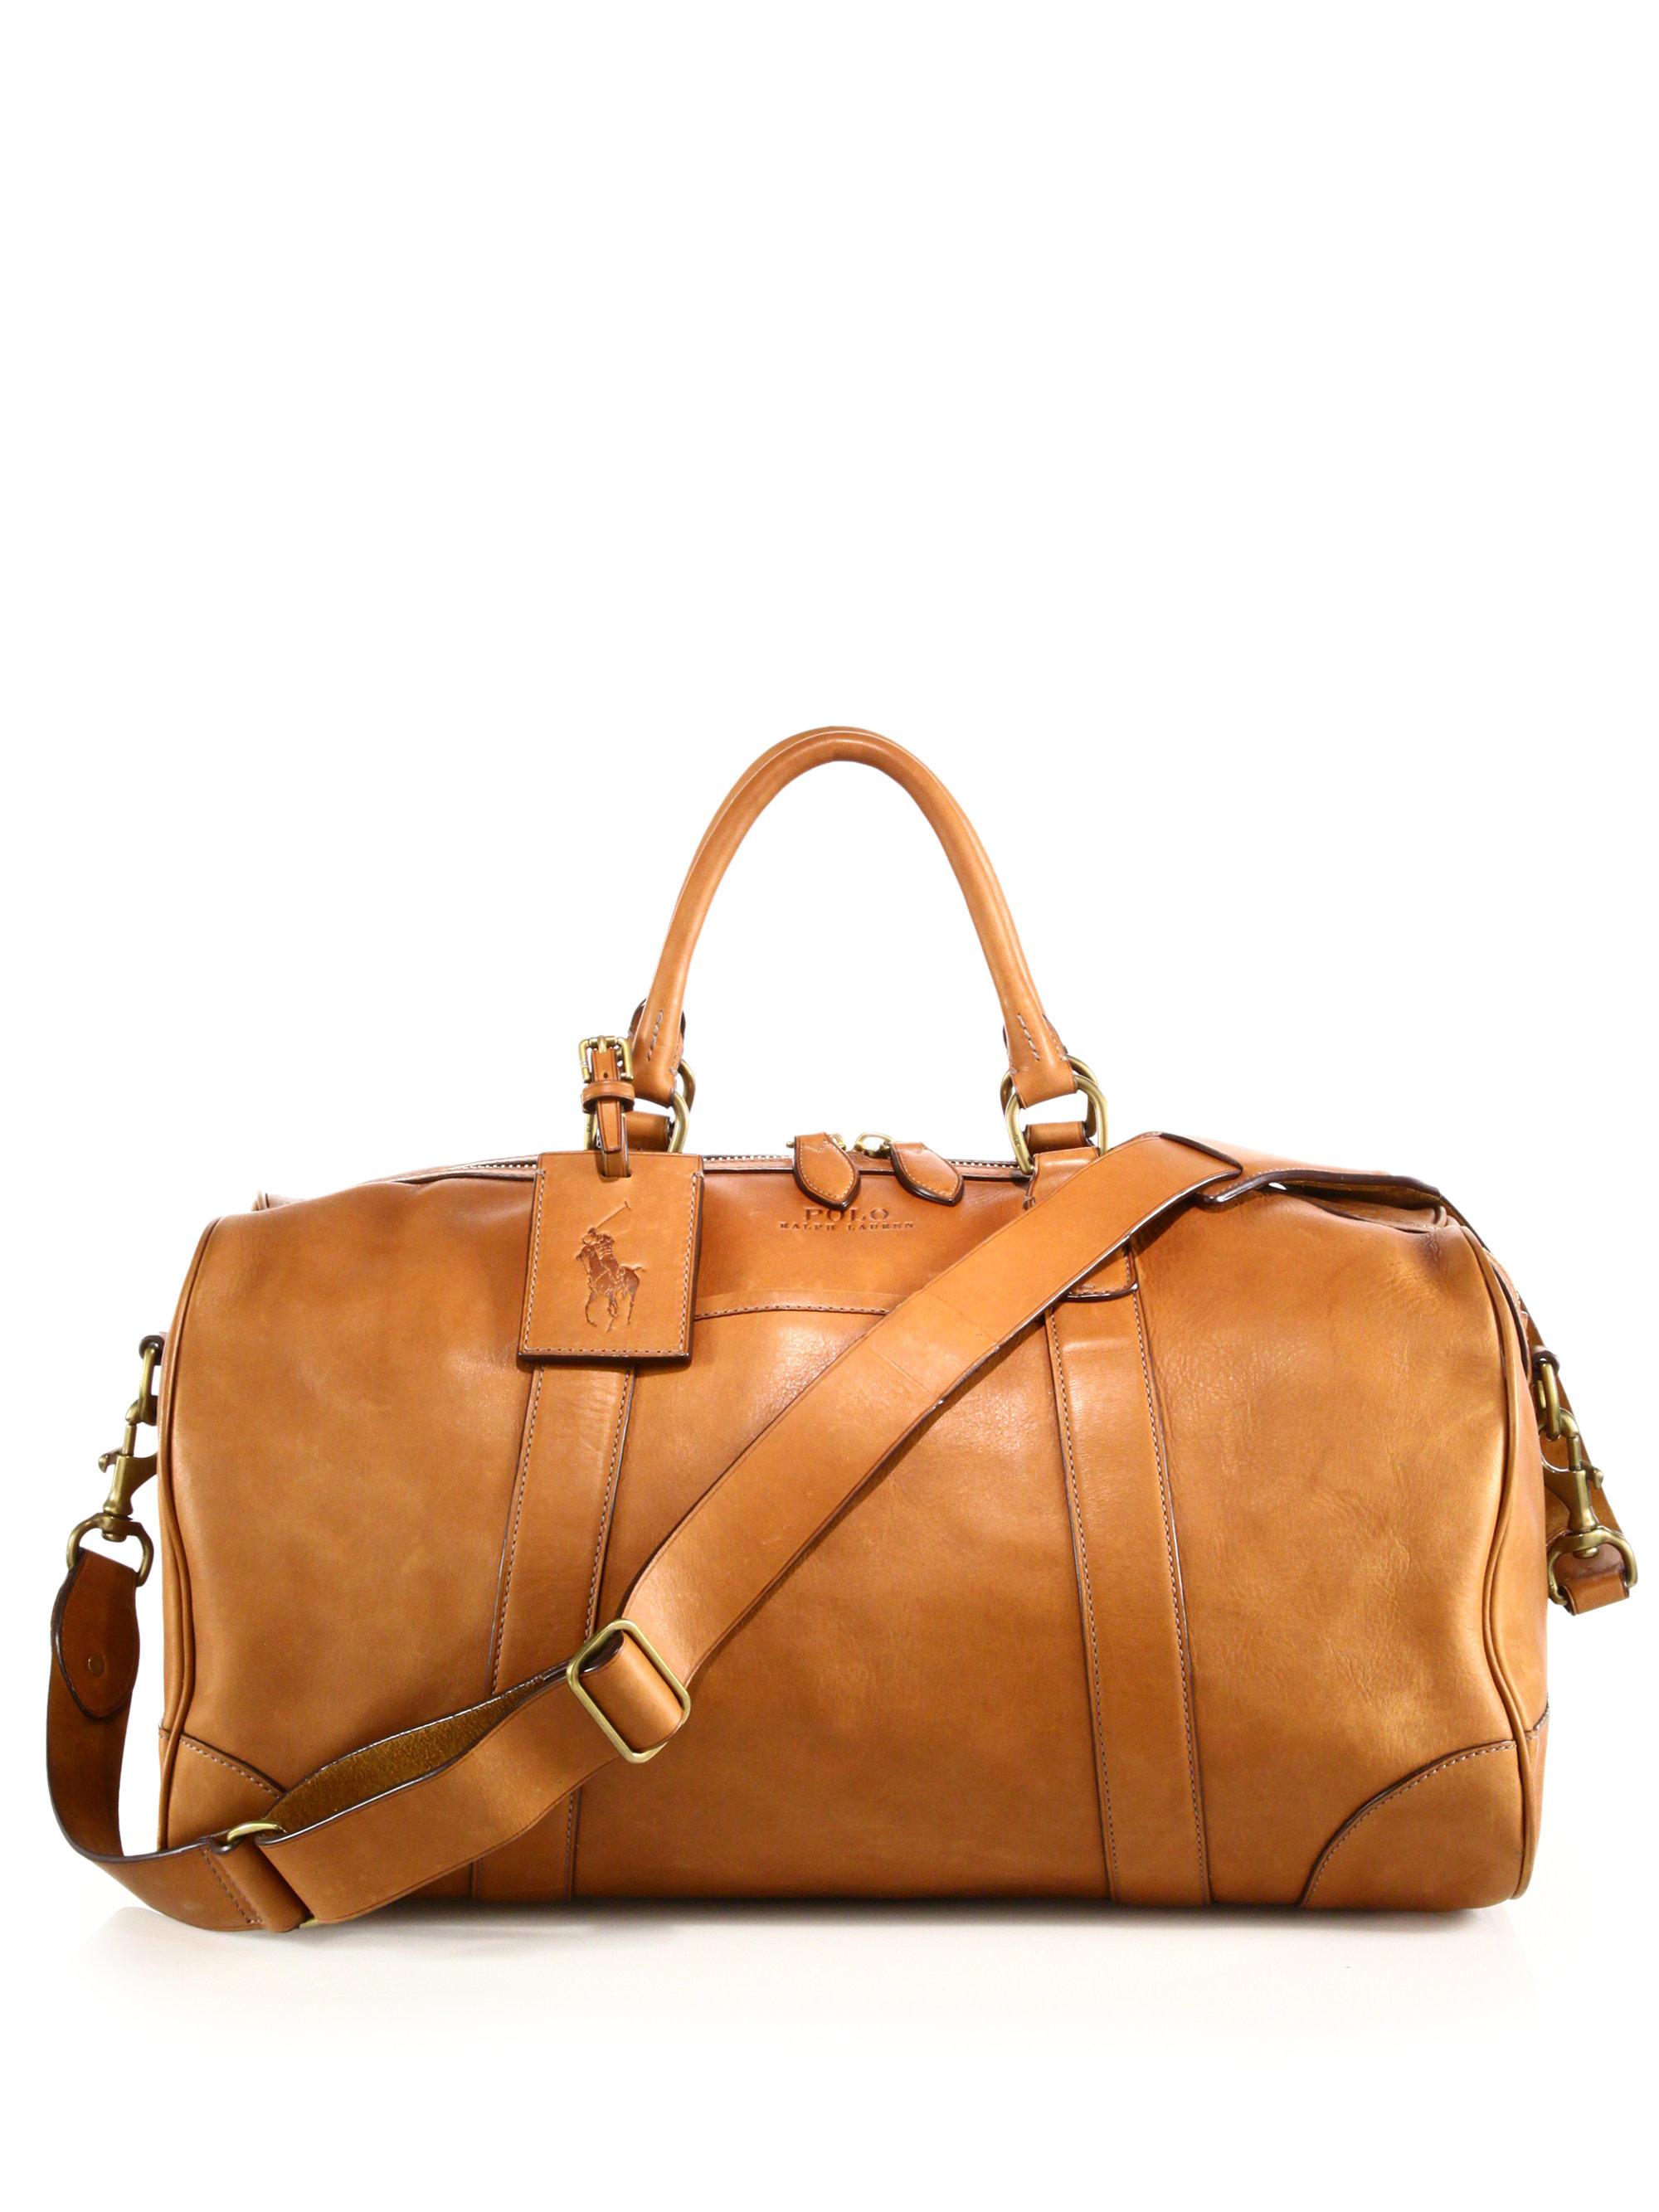 725f59d243b Polo Ralph Lauren Core Leather Duffle Bag   ReGreen Springfield